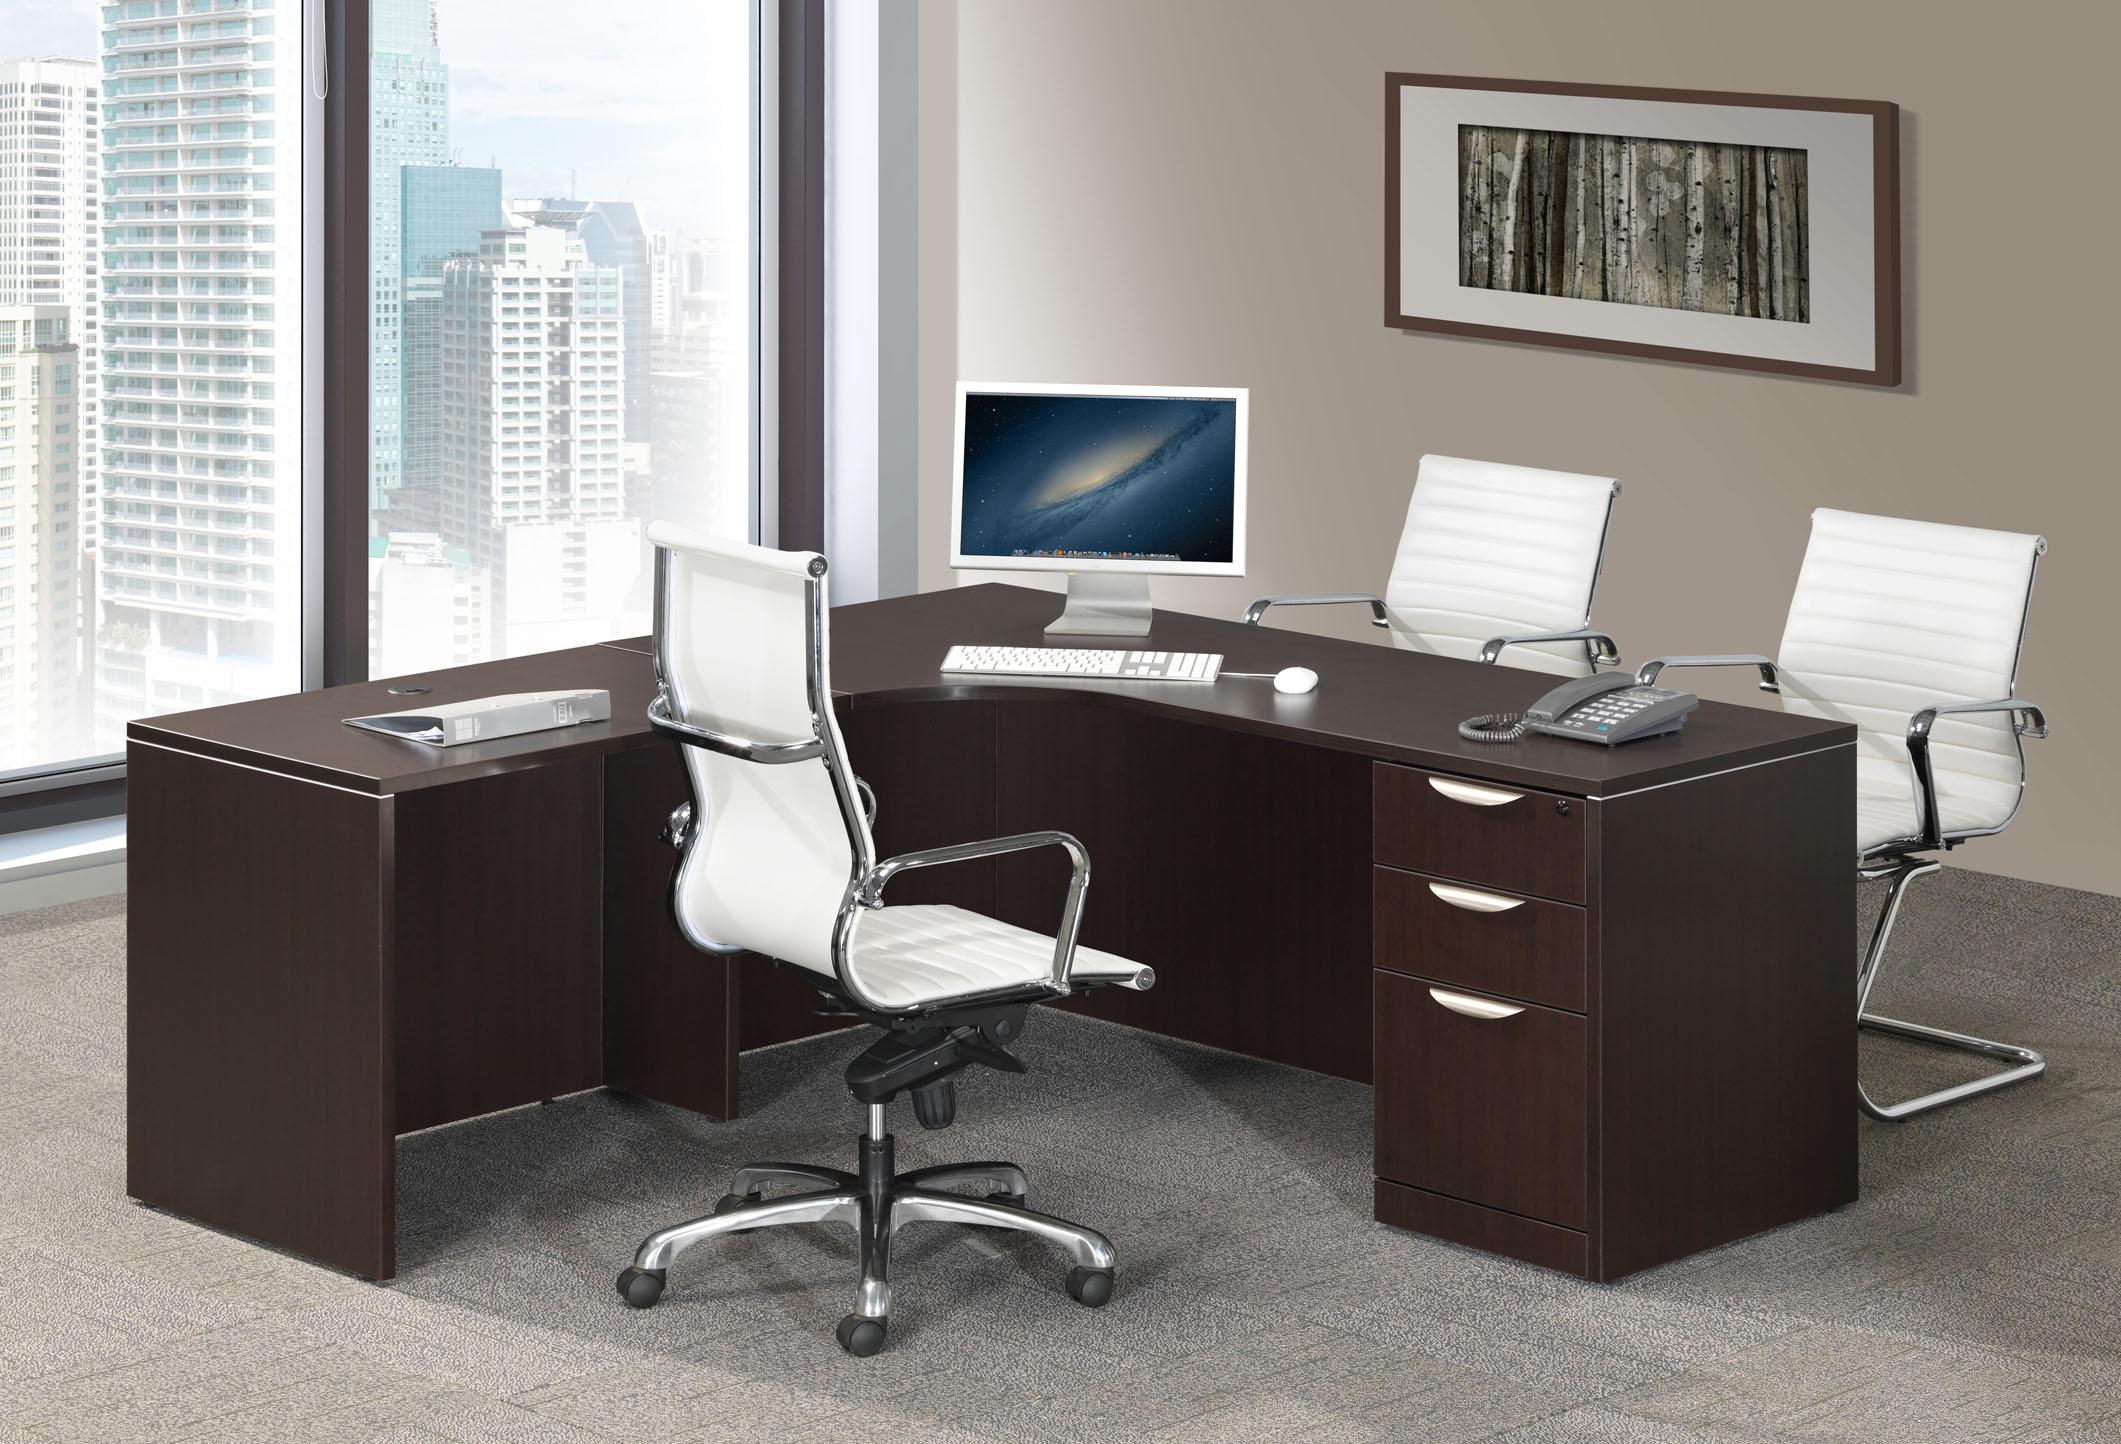 Office Source Laminate Desk Loveland Colorado New